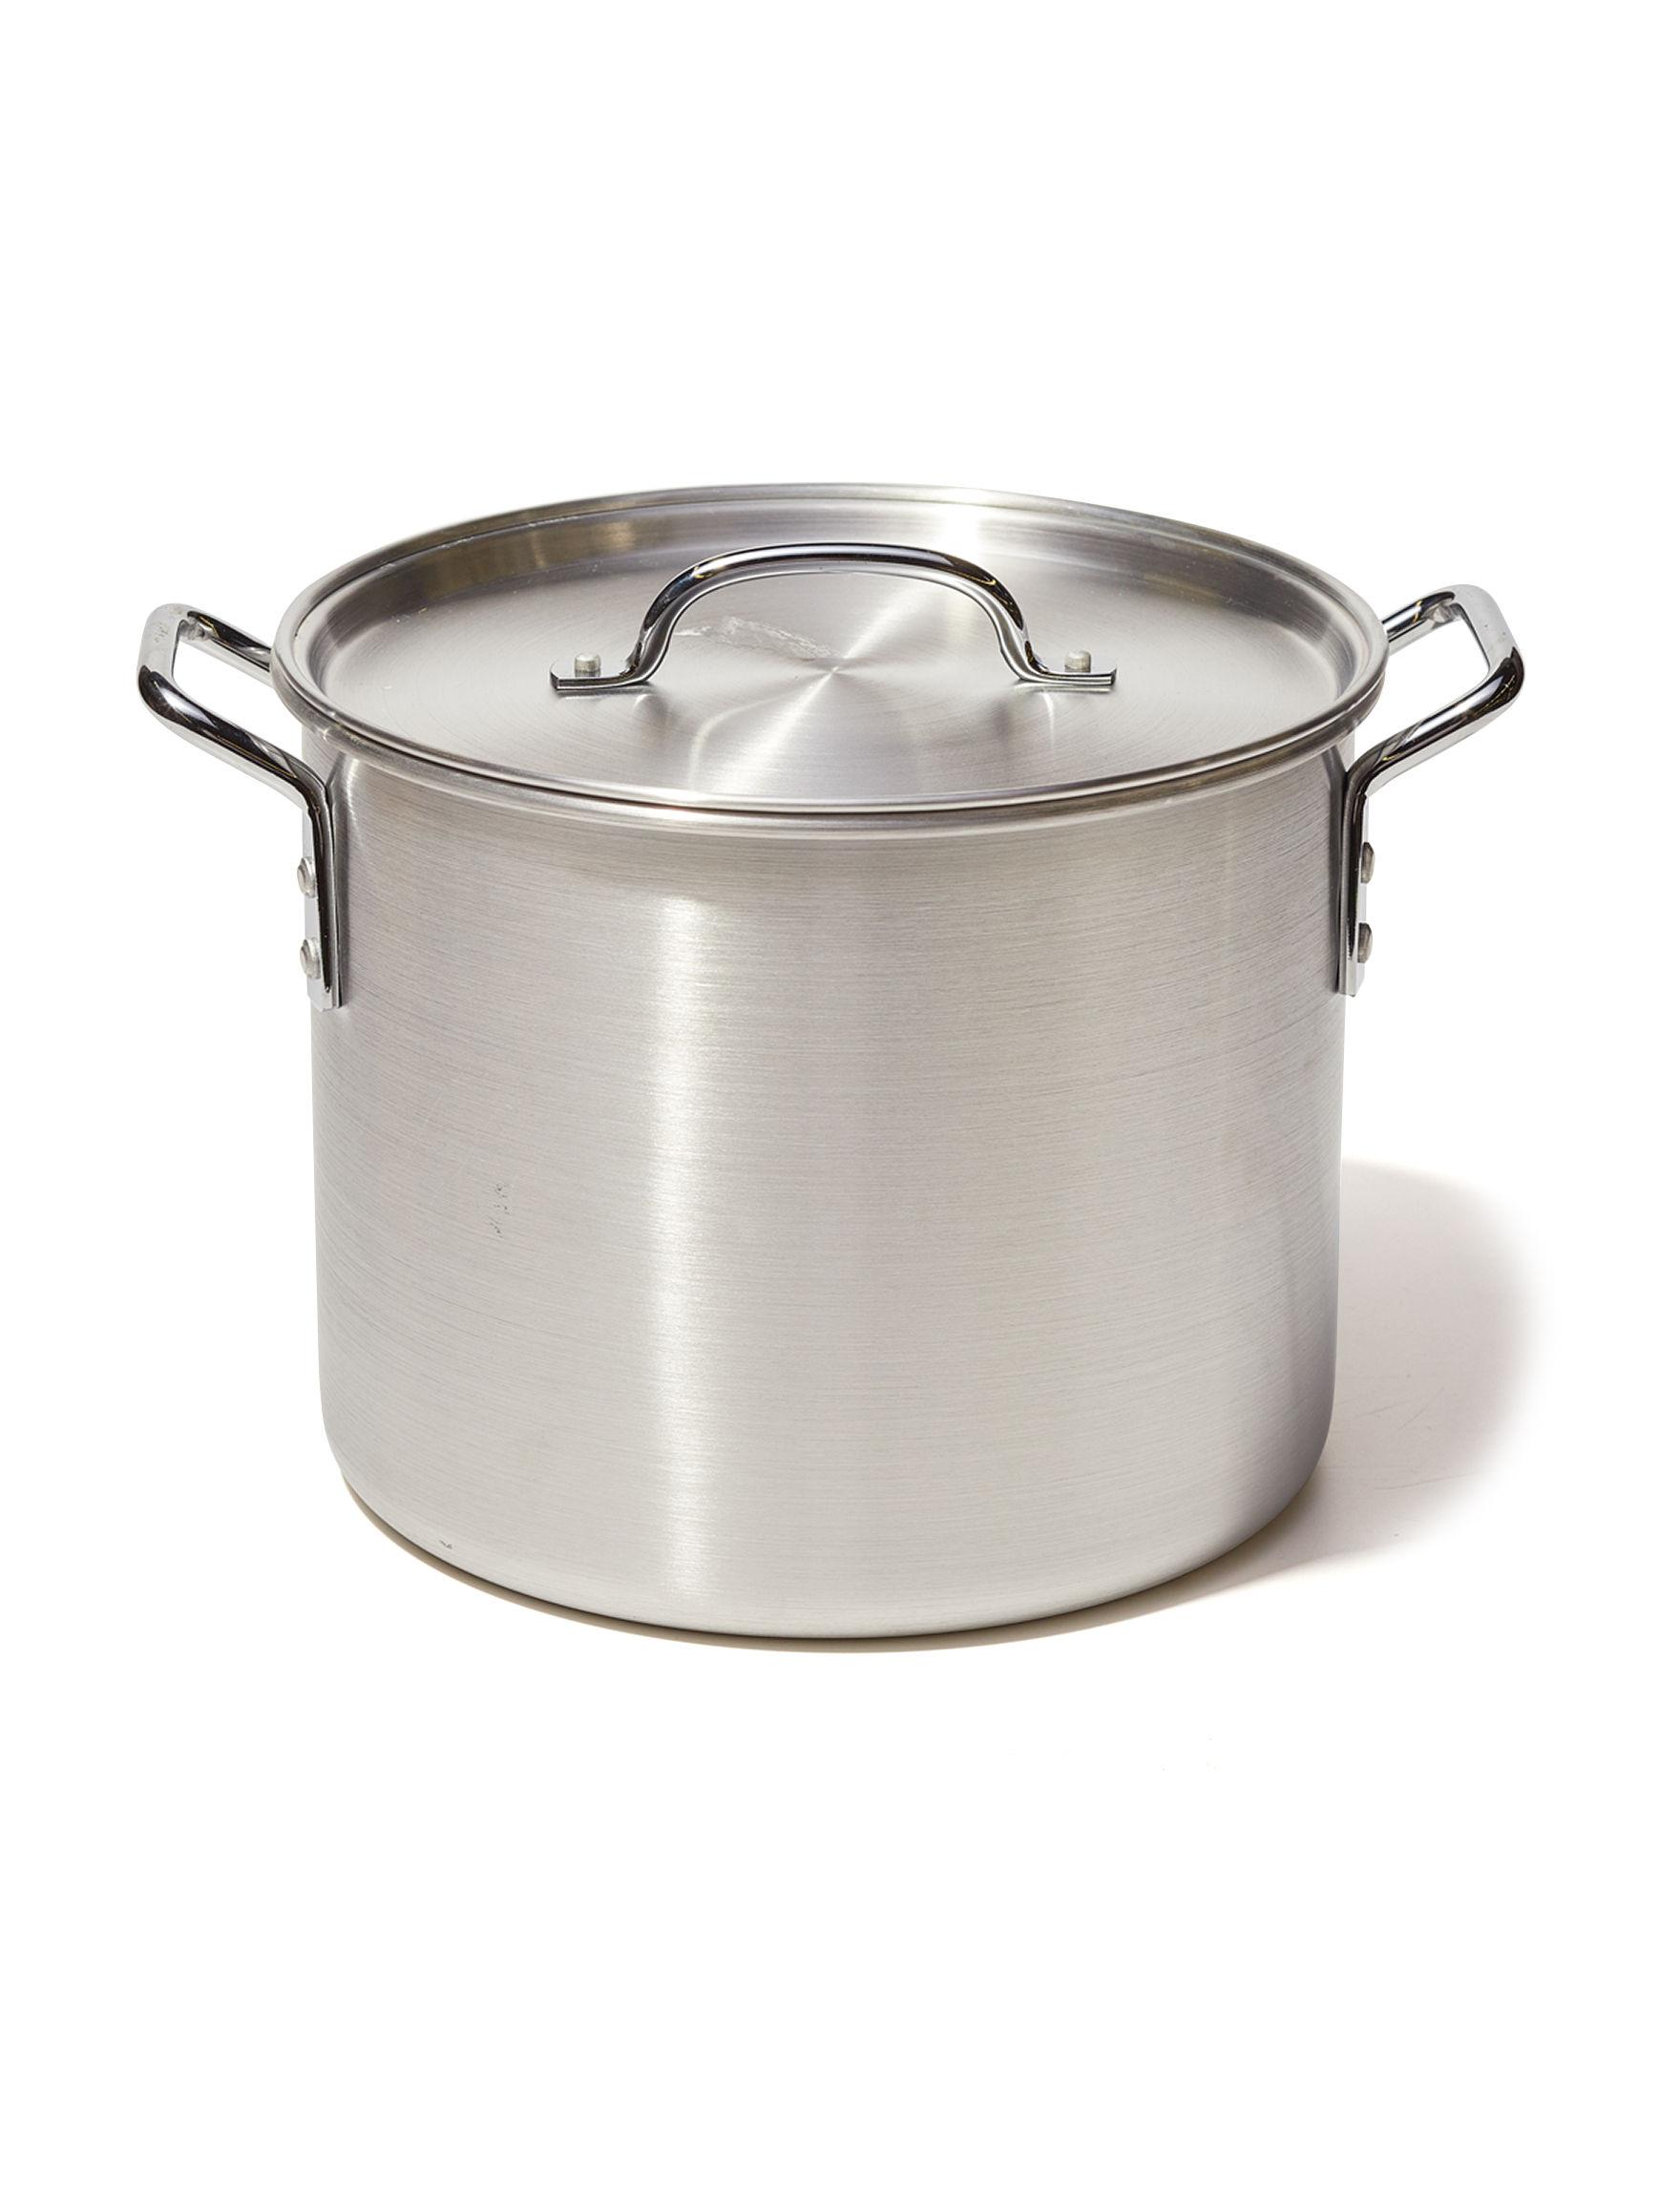 Reflex Sales Silver Pots & Dutch Ovens Cookware